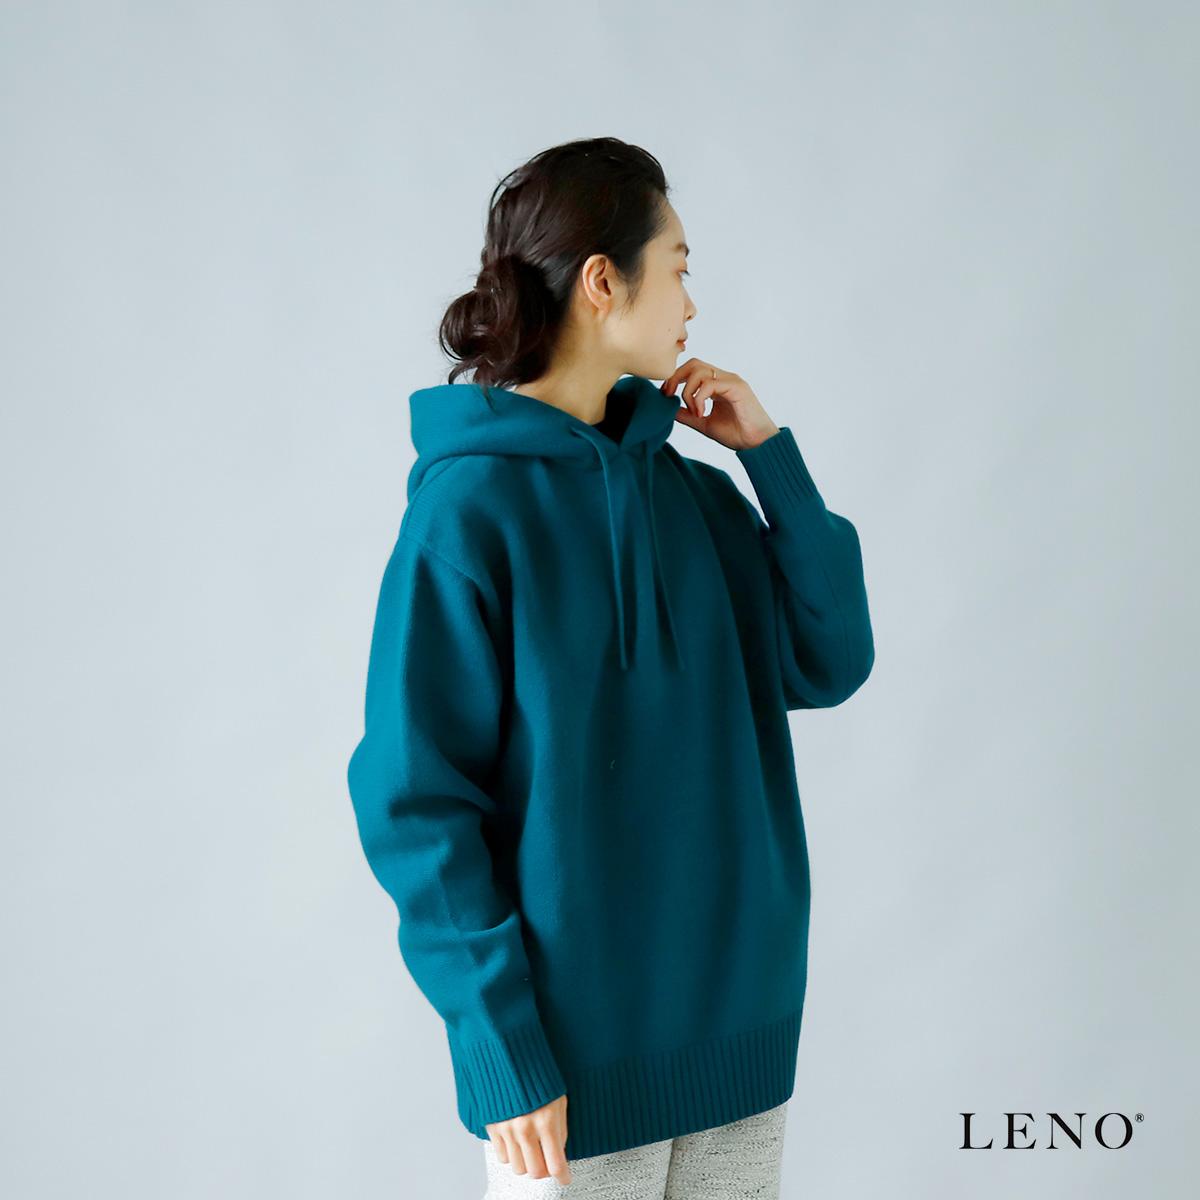 LENO(リノ)エクストラスーパーファインウール プルオーバーニットパーカー leno-k002